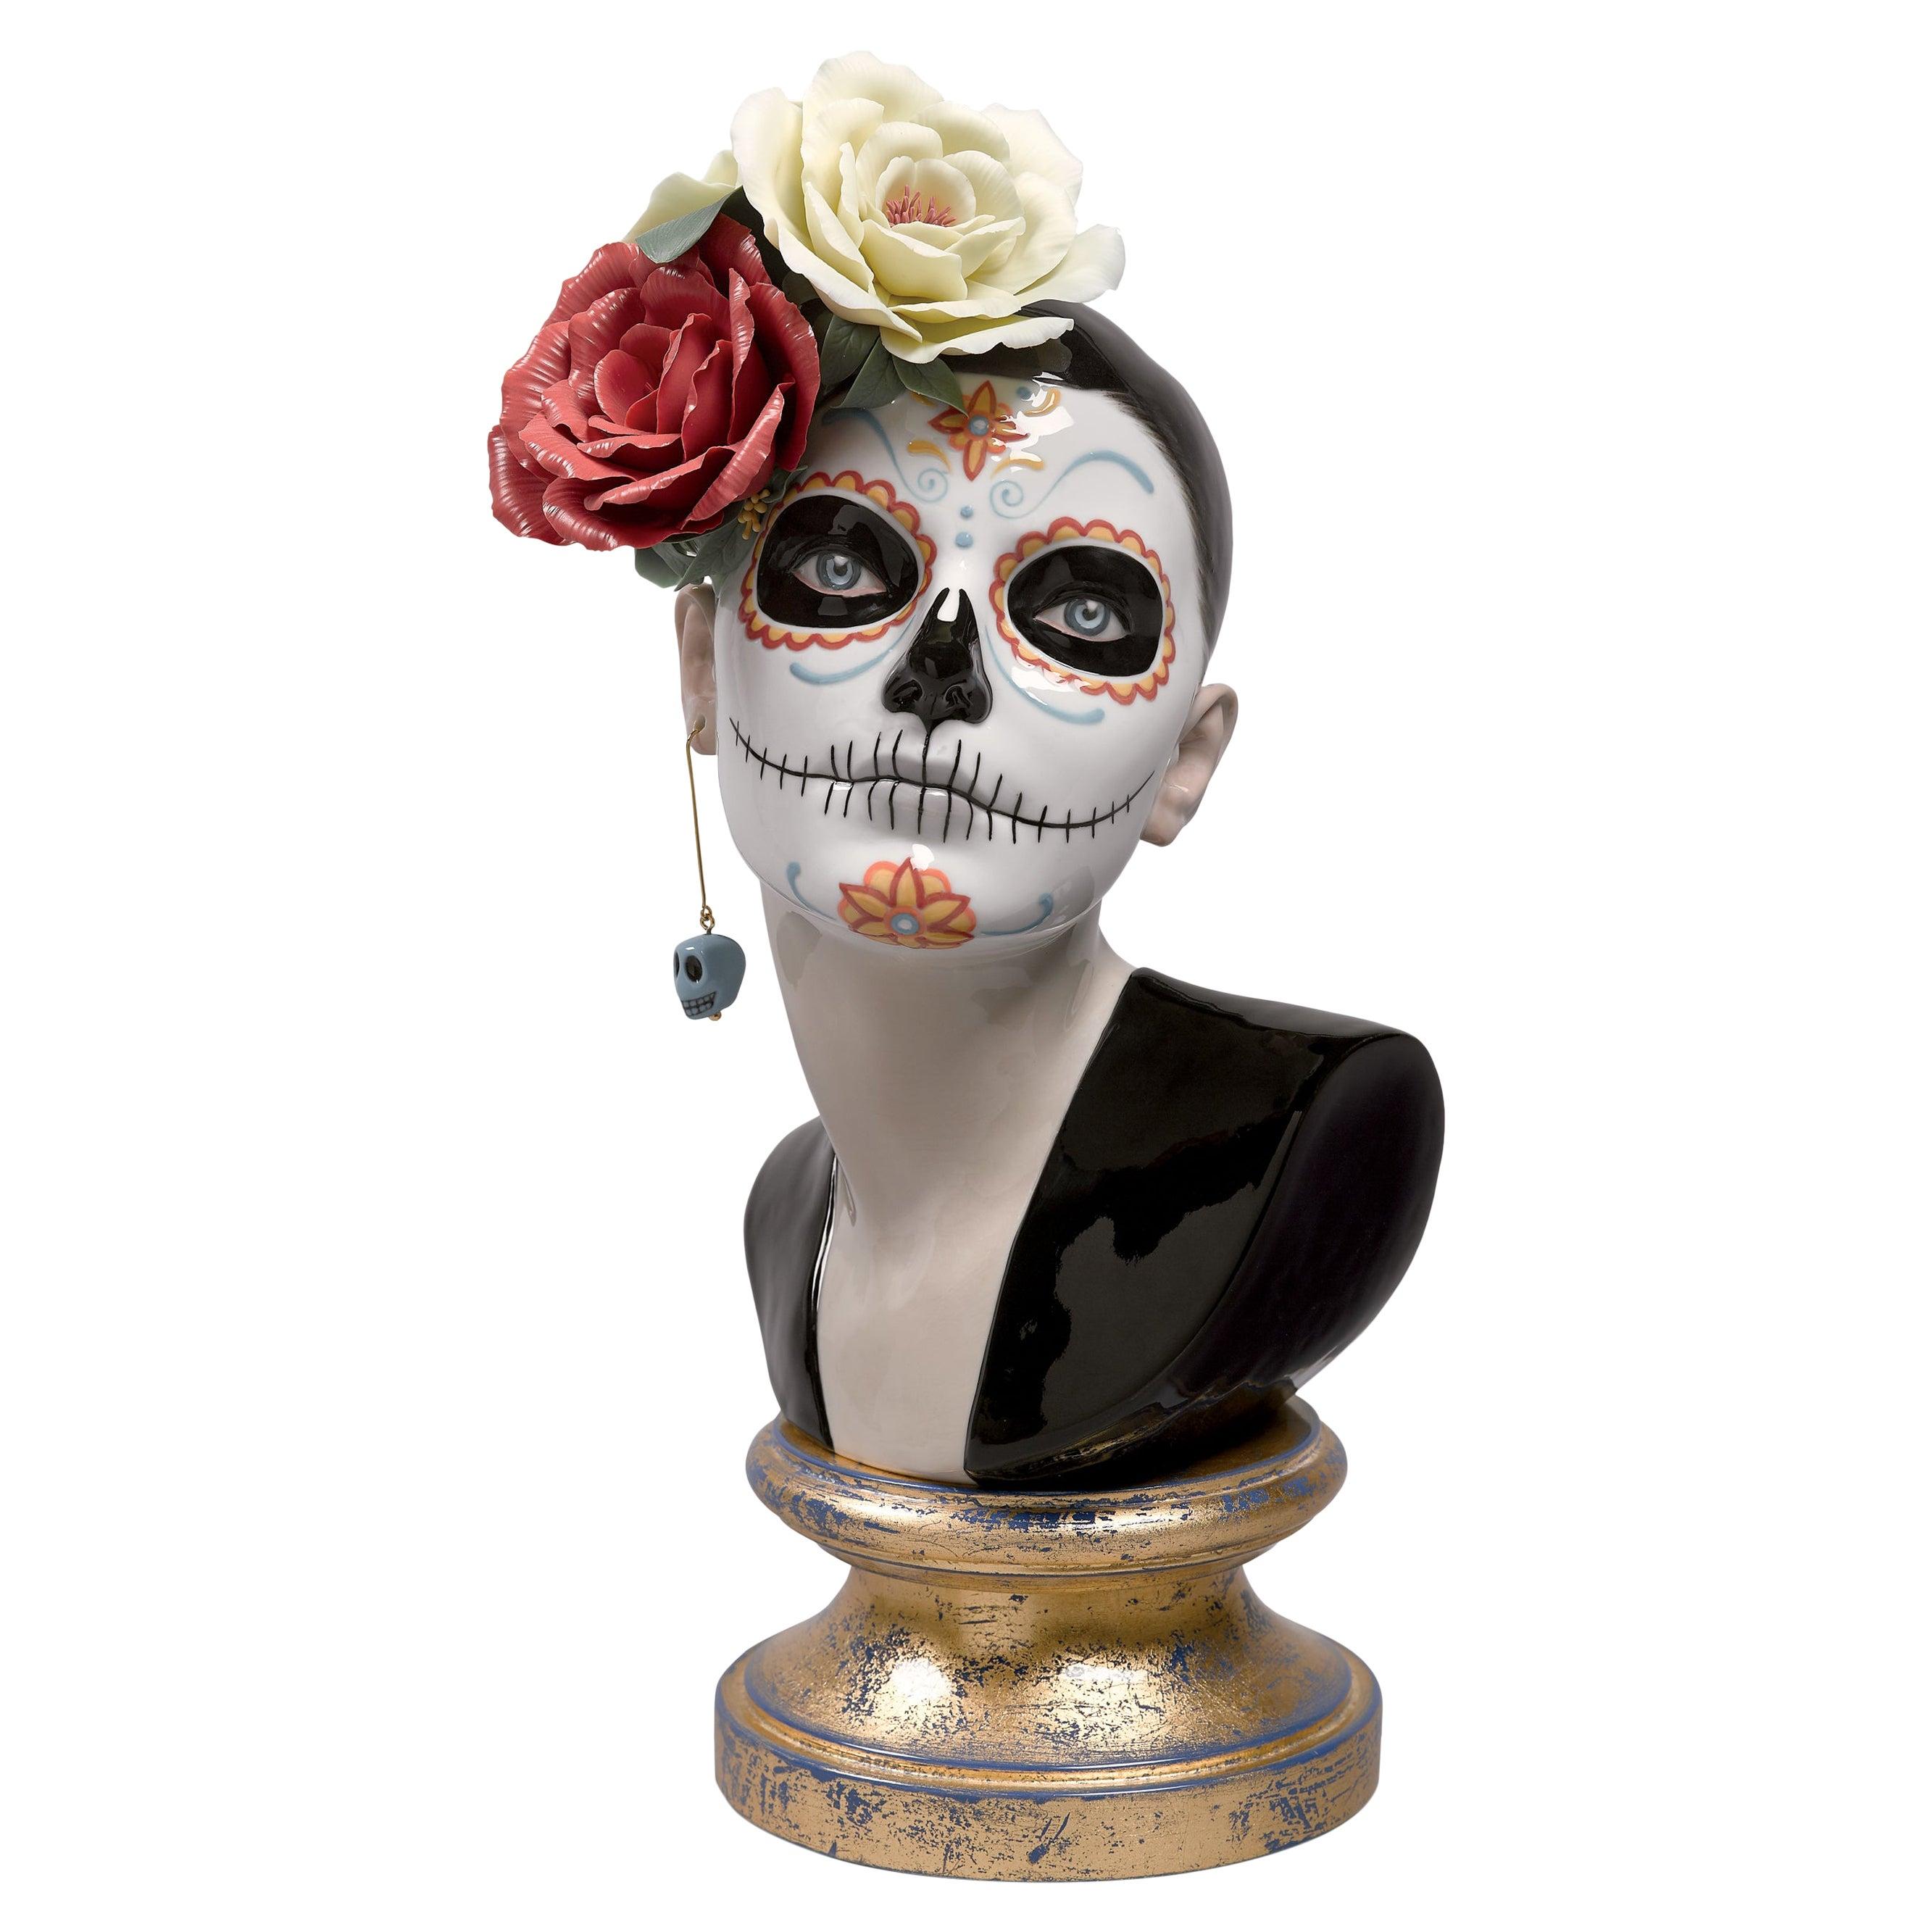 Lladro Beautiful Catrina Figurine by Raul Rubio. Limited Edition.